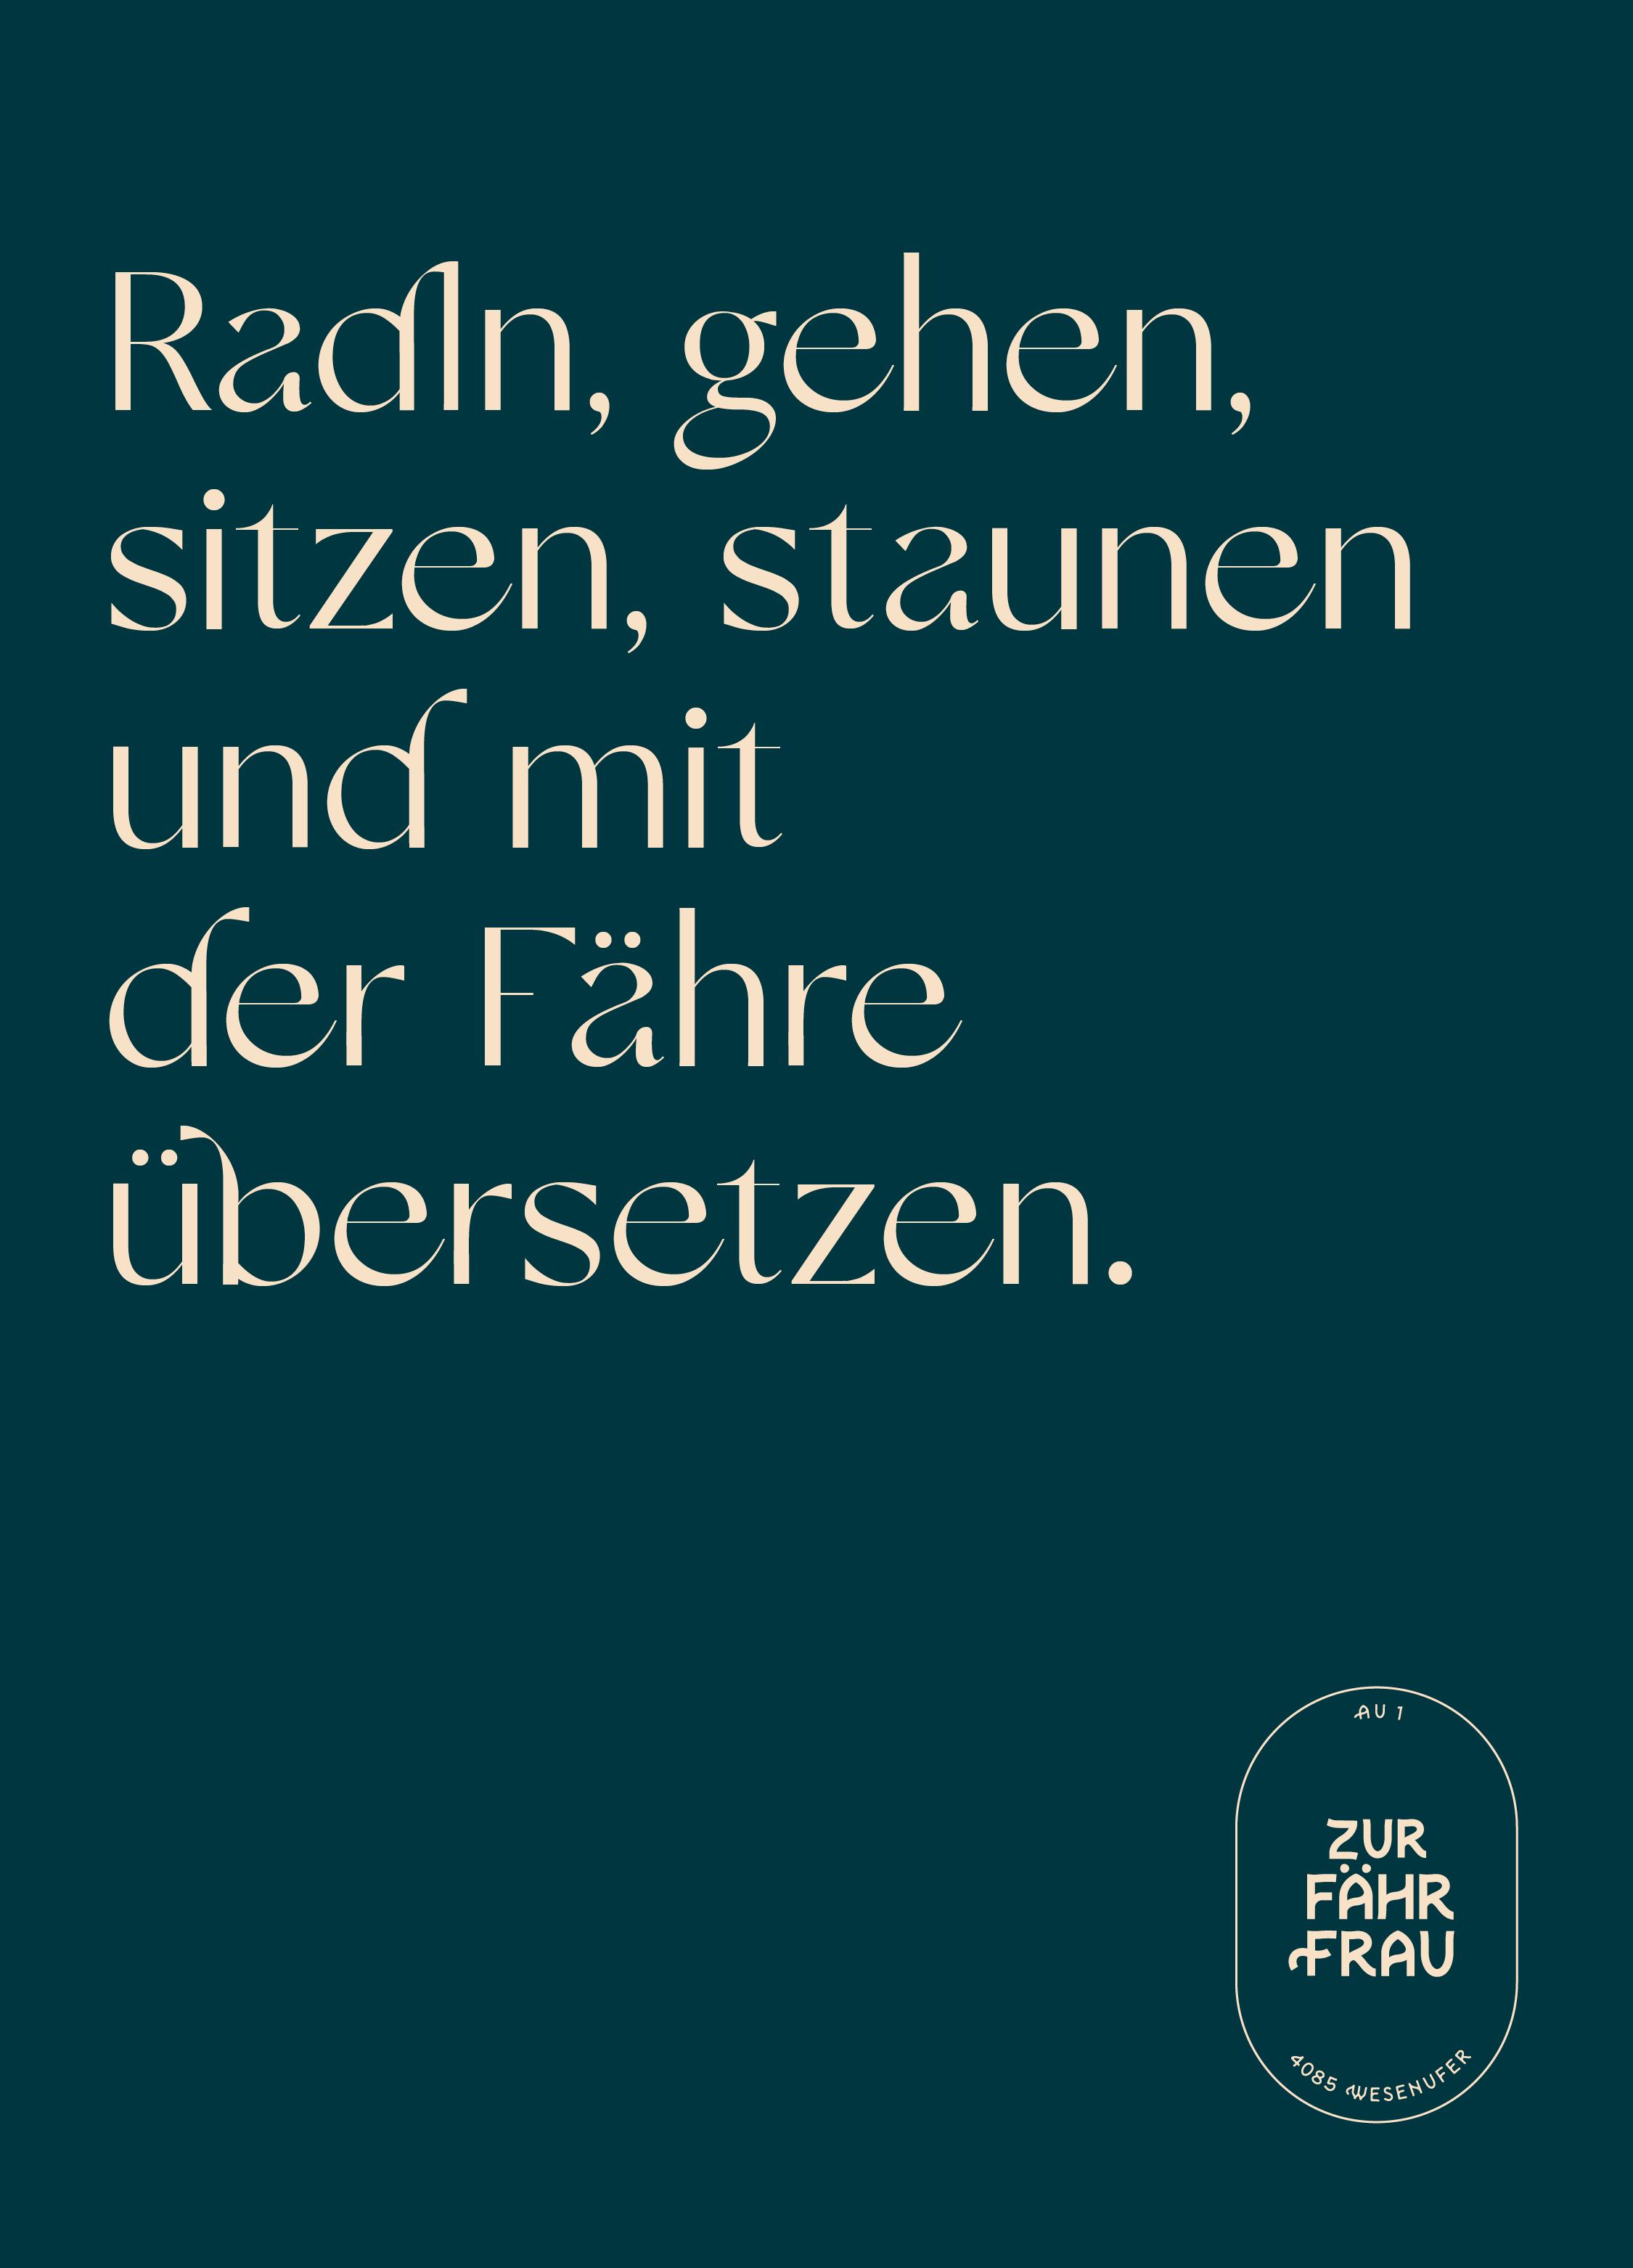 Ref Faehrfrau Website 17 Text